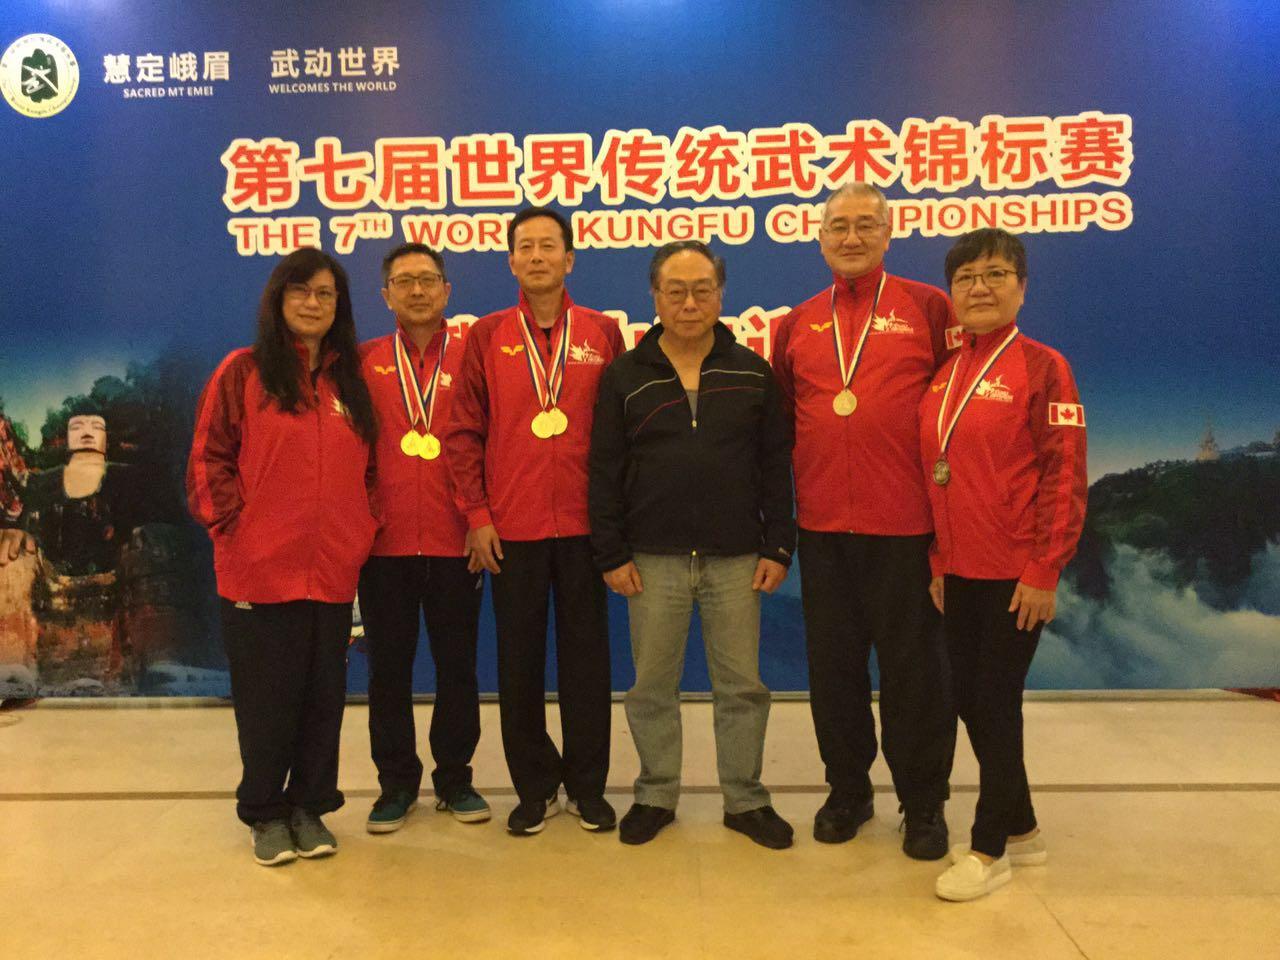 2017 World Kung Fu Championships